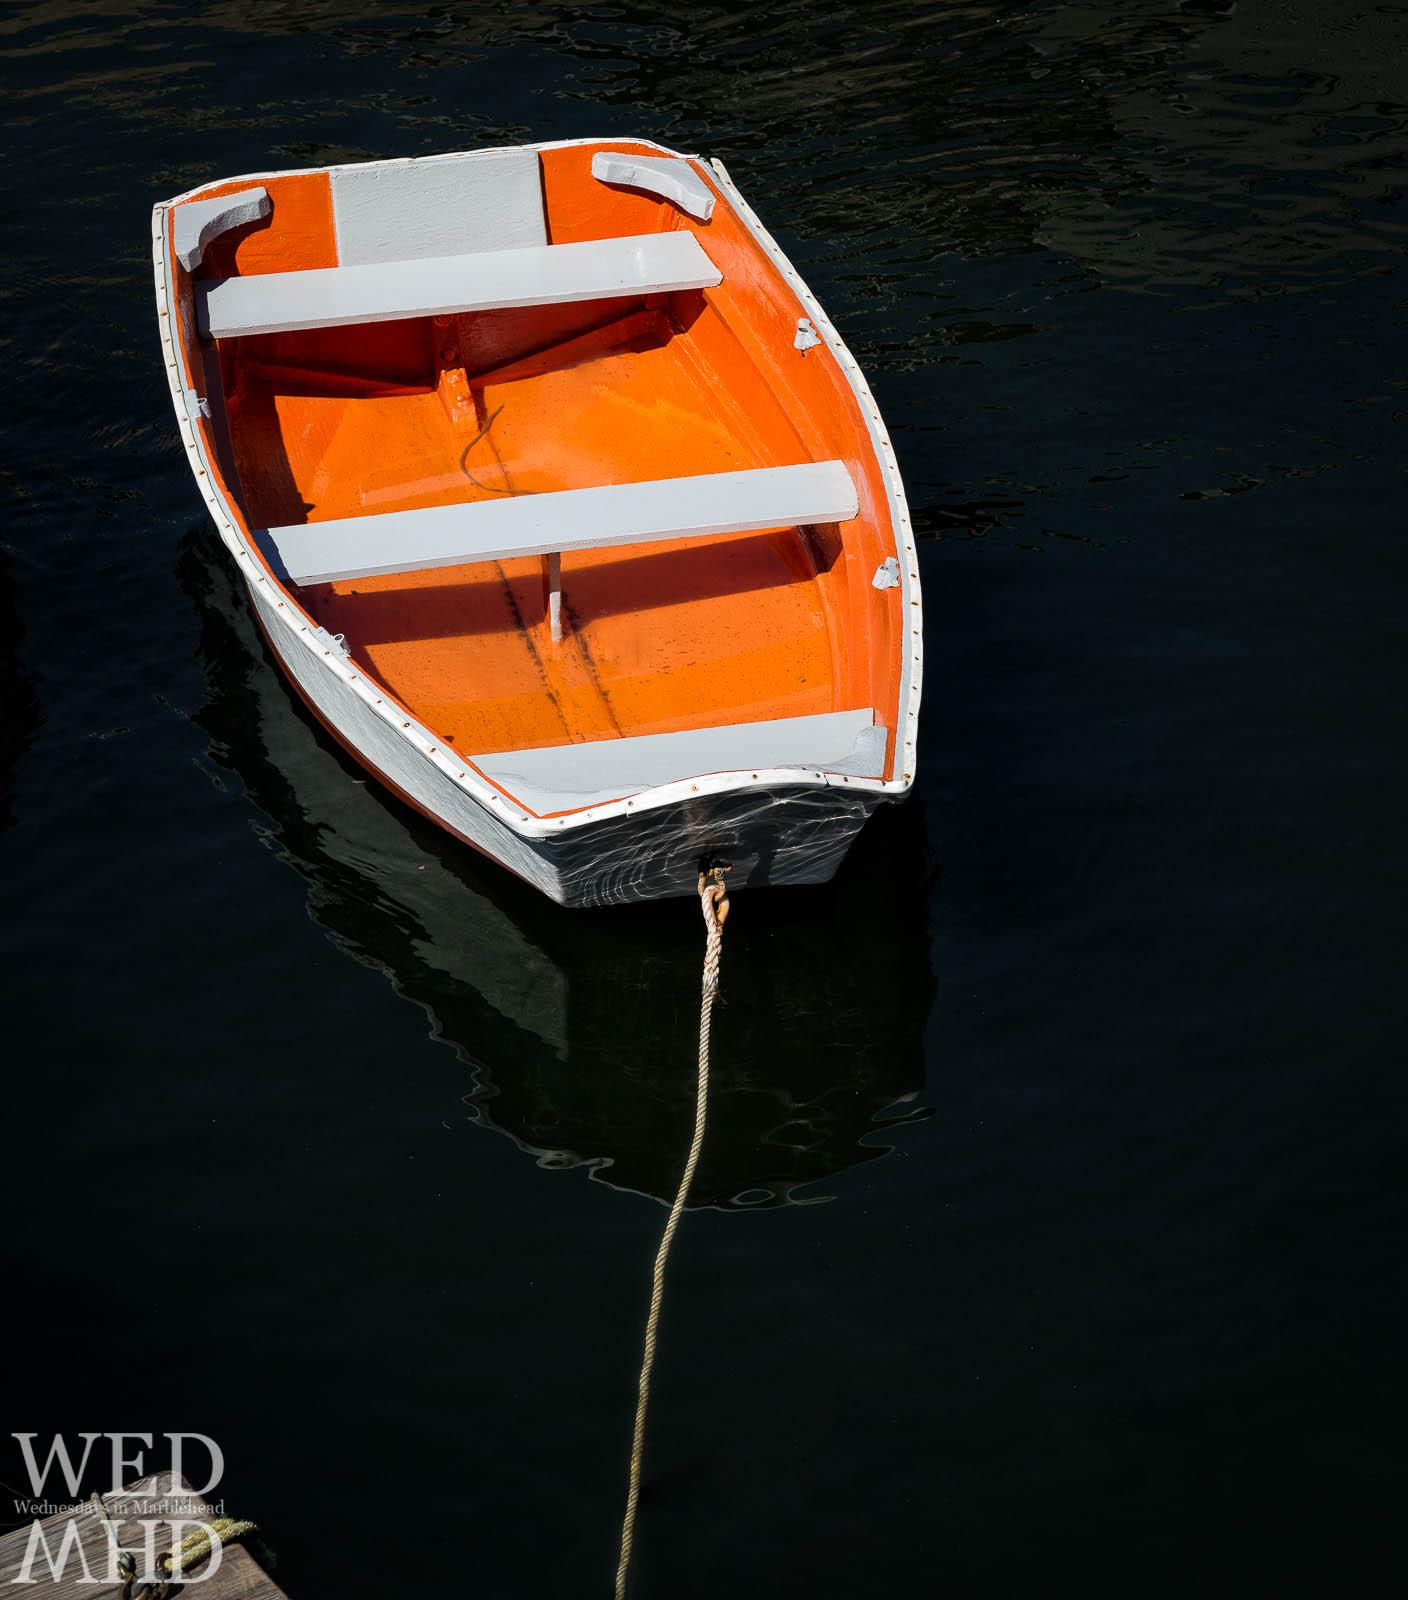 Orange Dinghy in Marblehead Harbor